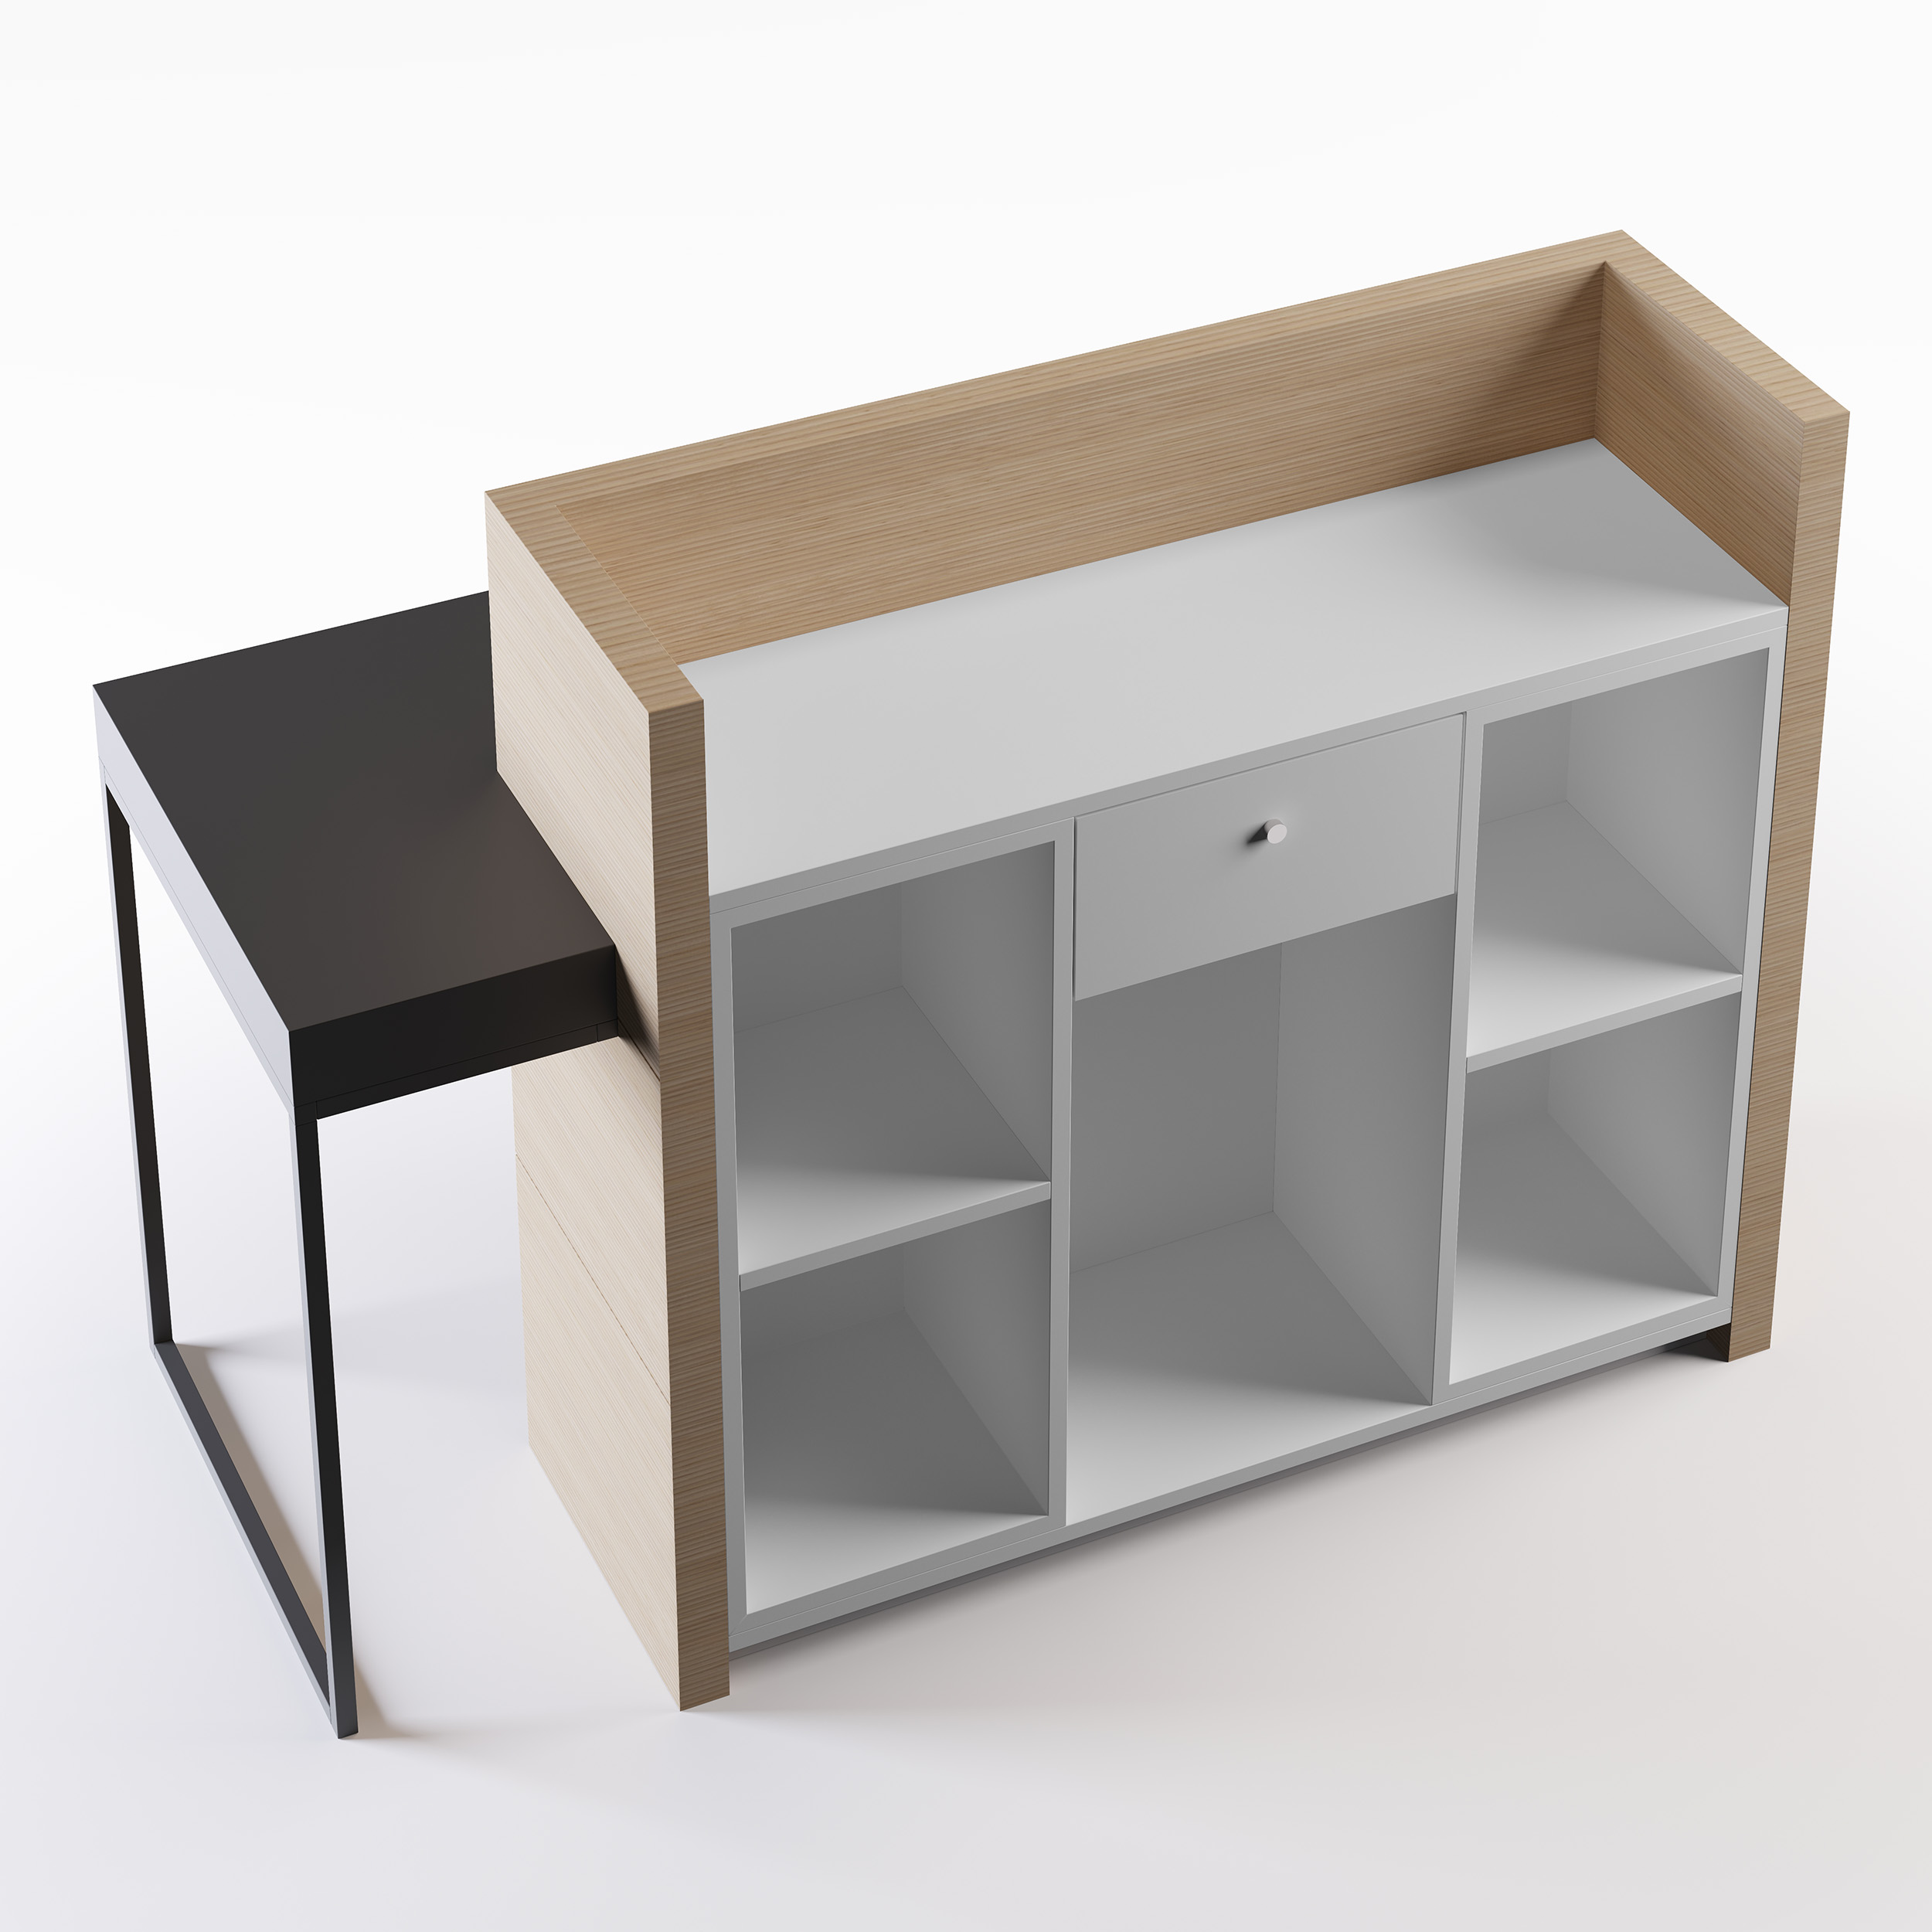 PHILOSOPHY_cash desk model 150_C copy.JPG